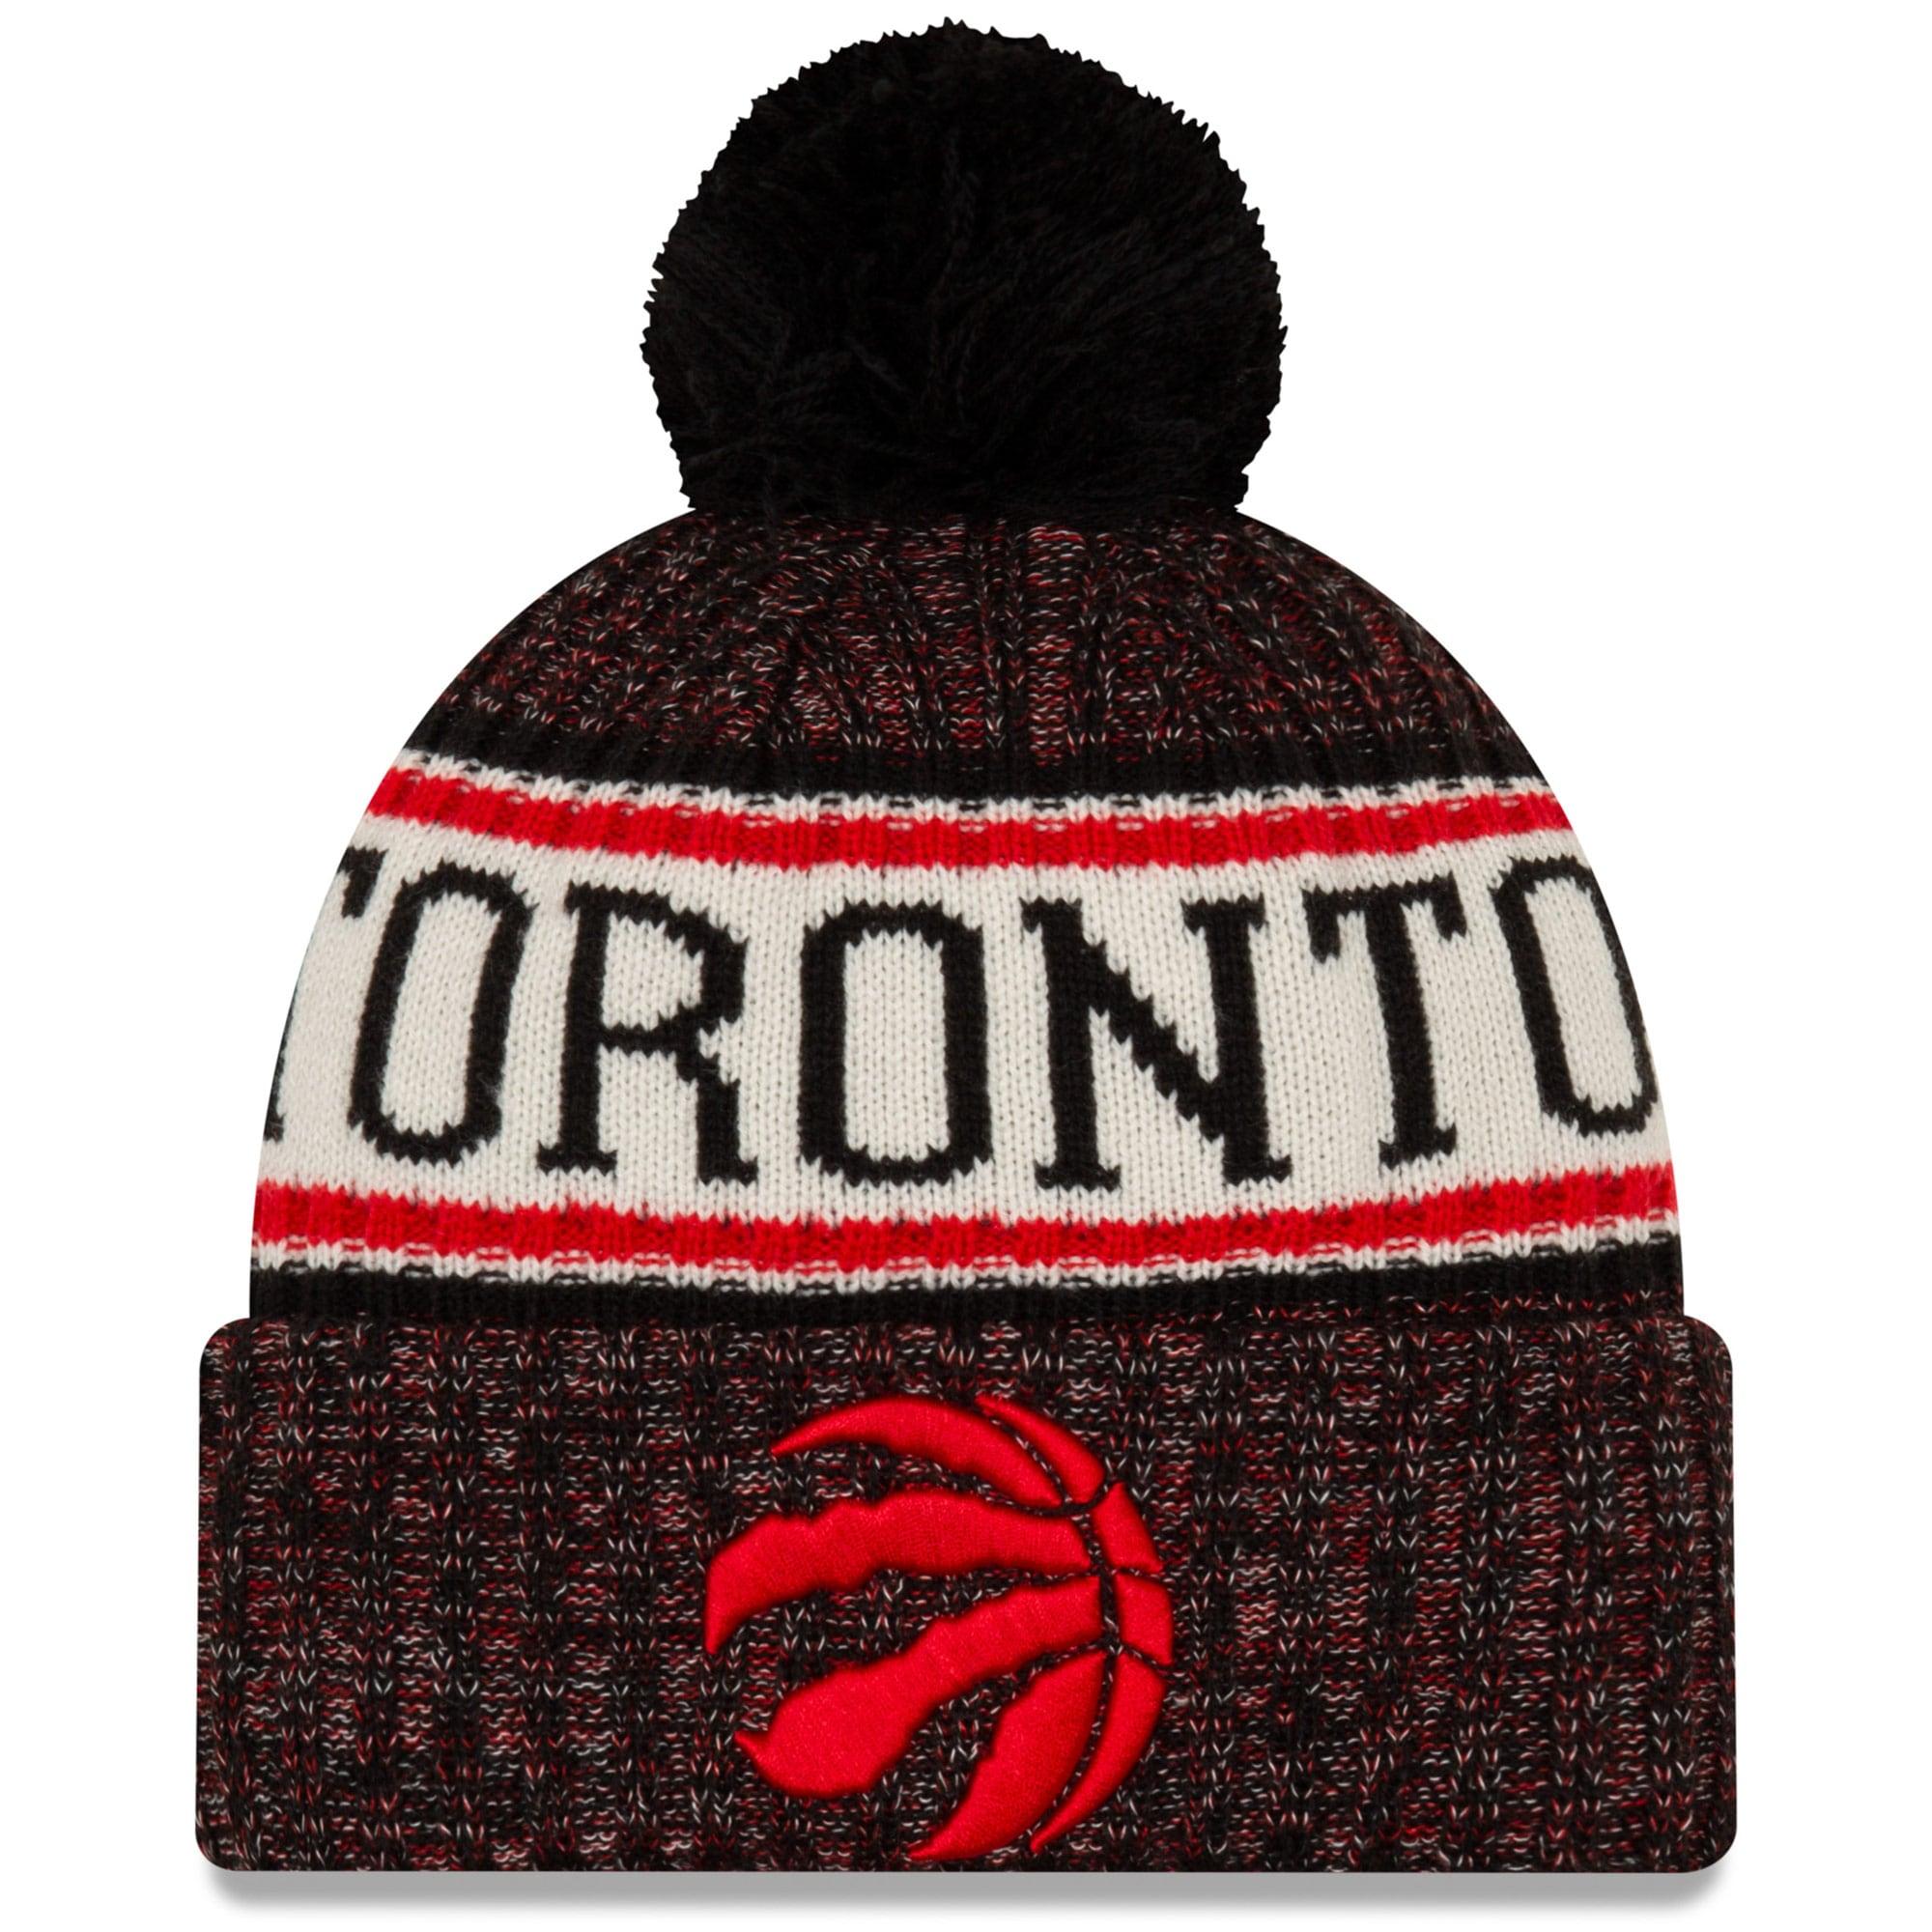 Toronto Raptors New Era Sport Cuffed Knit Hat with Pom - Black